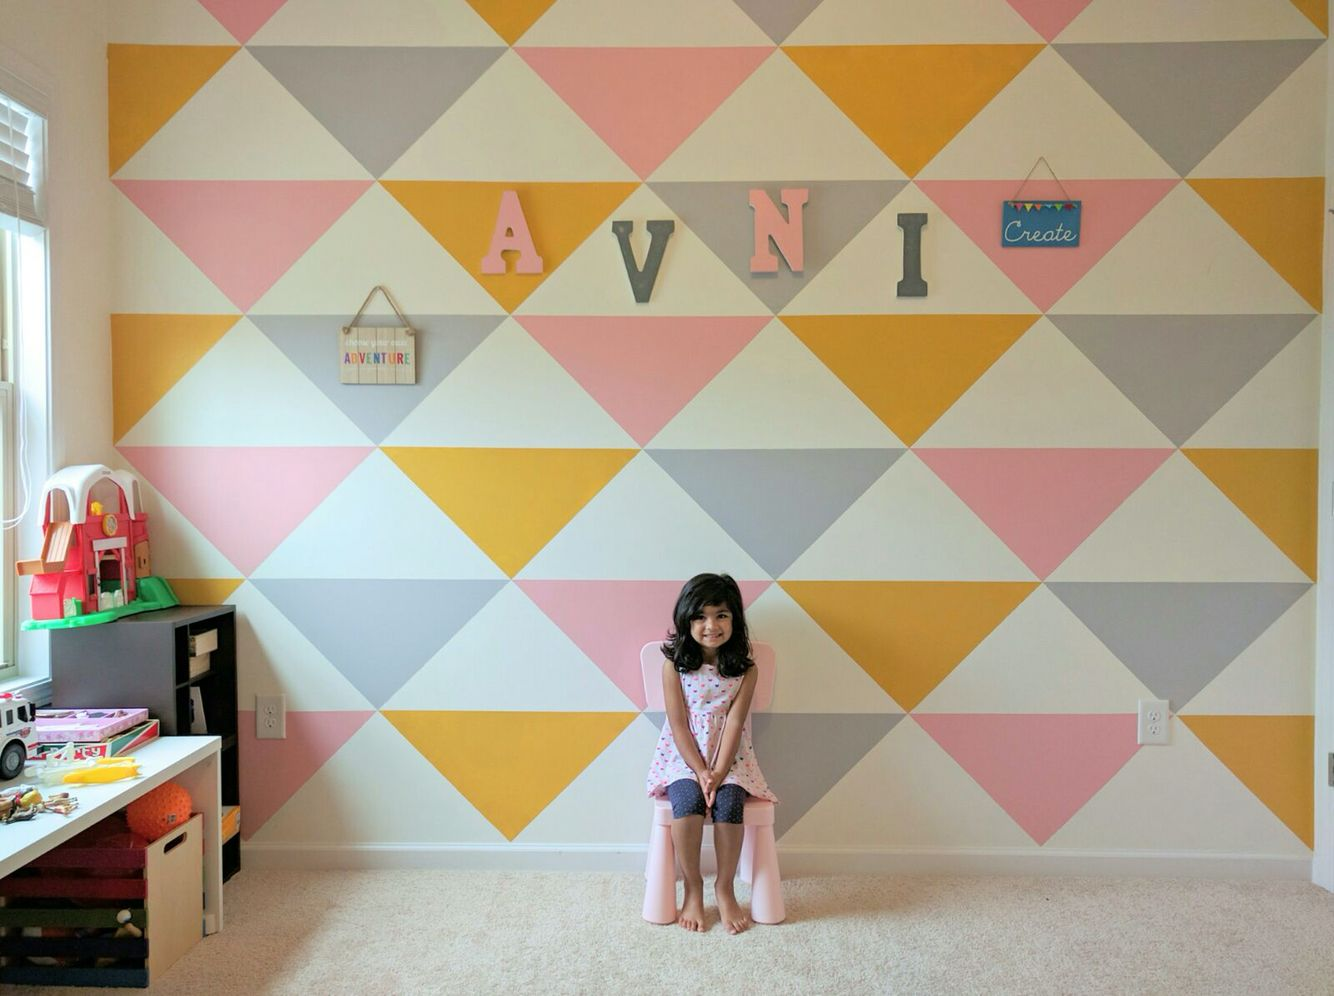 avni s room accent wall triangular pattern wall painting pastel rh pinterest com